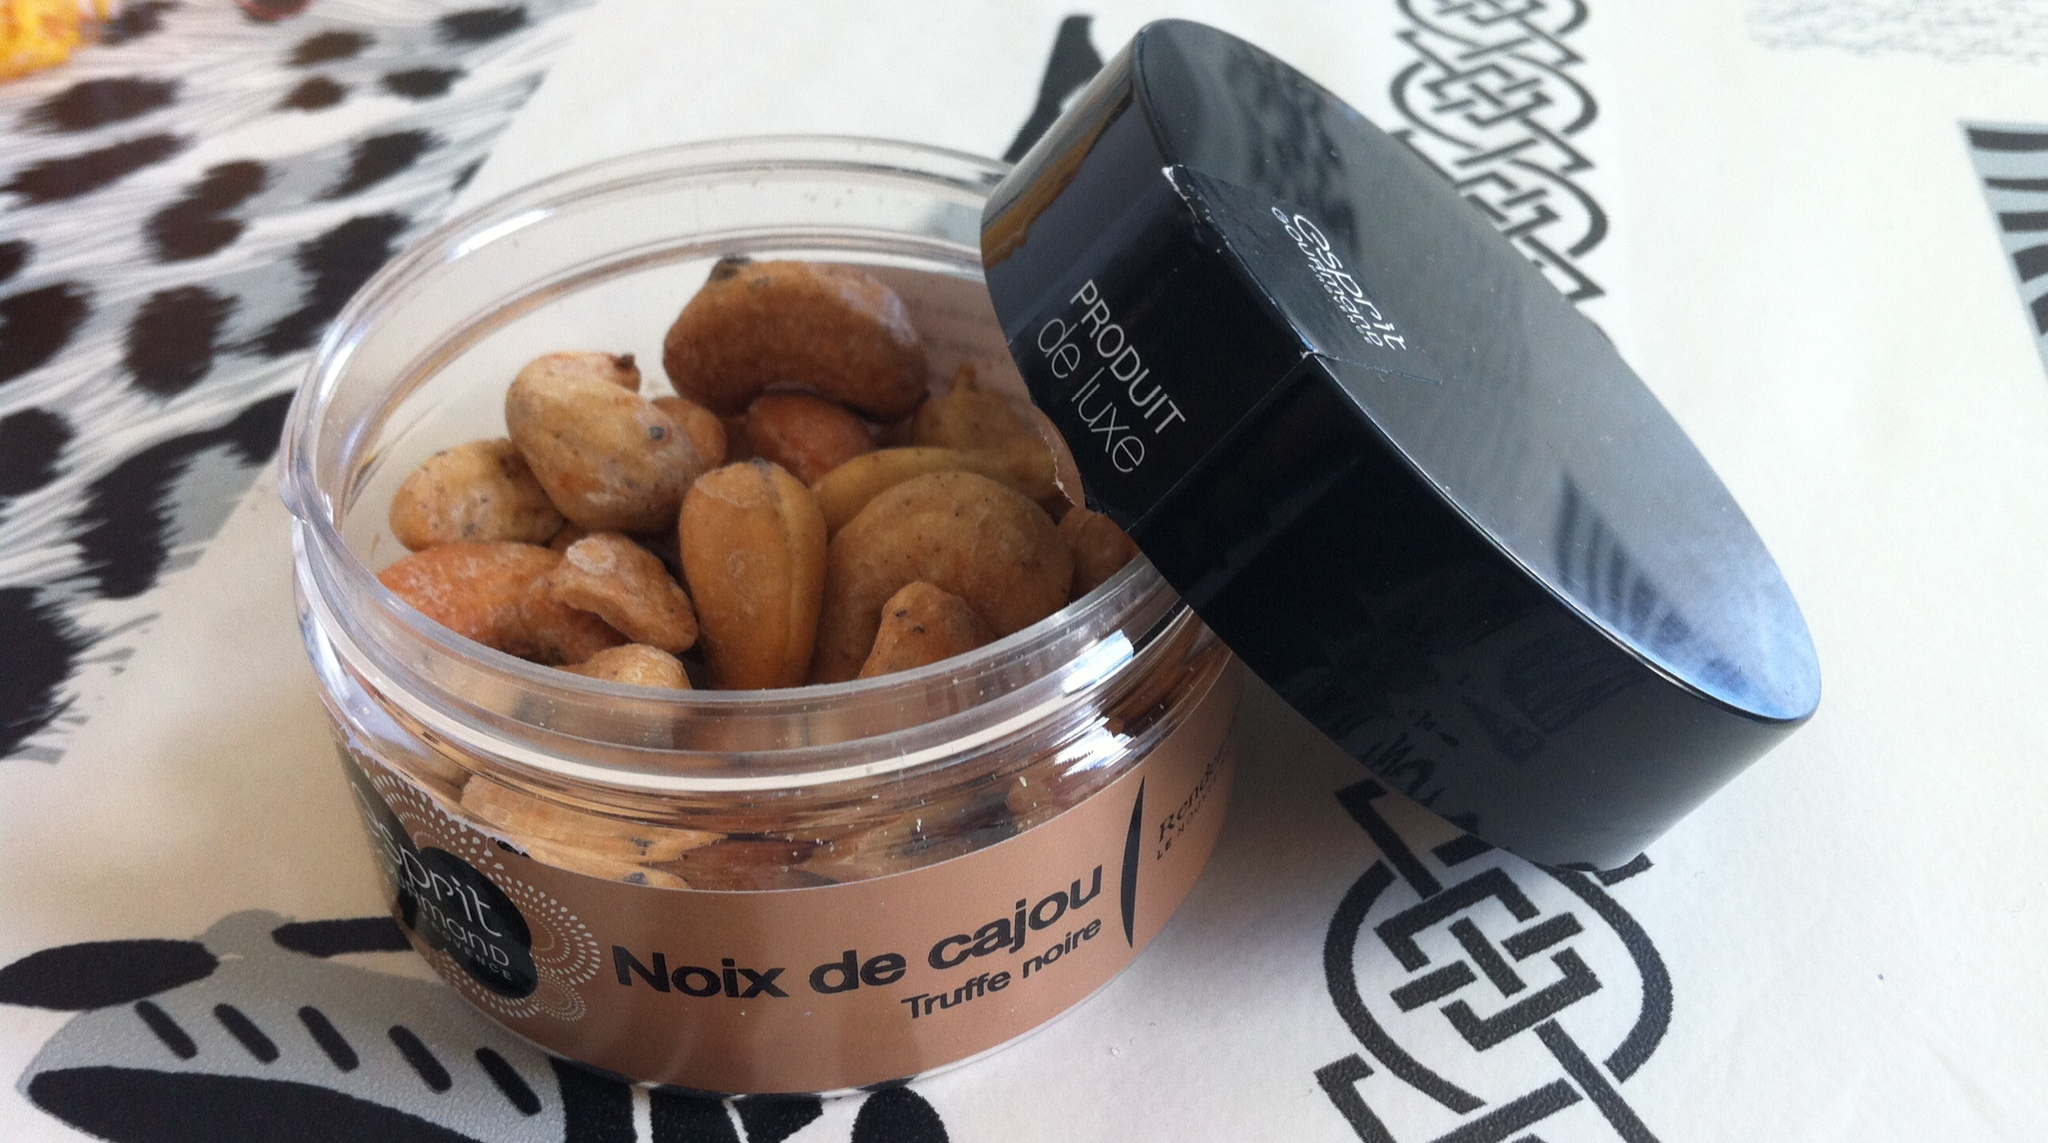 esprit-gourmand_noix-cajou-truffe